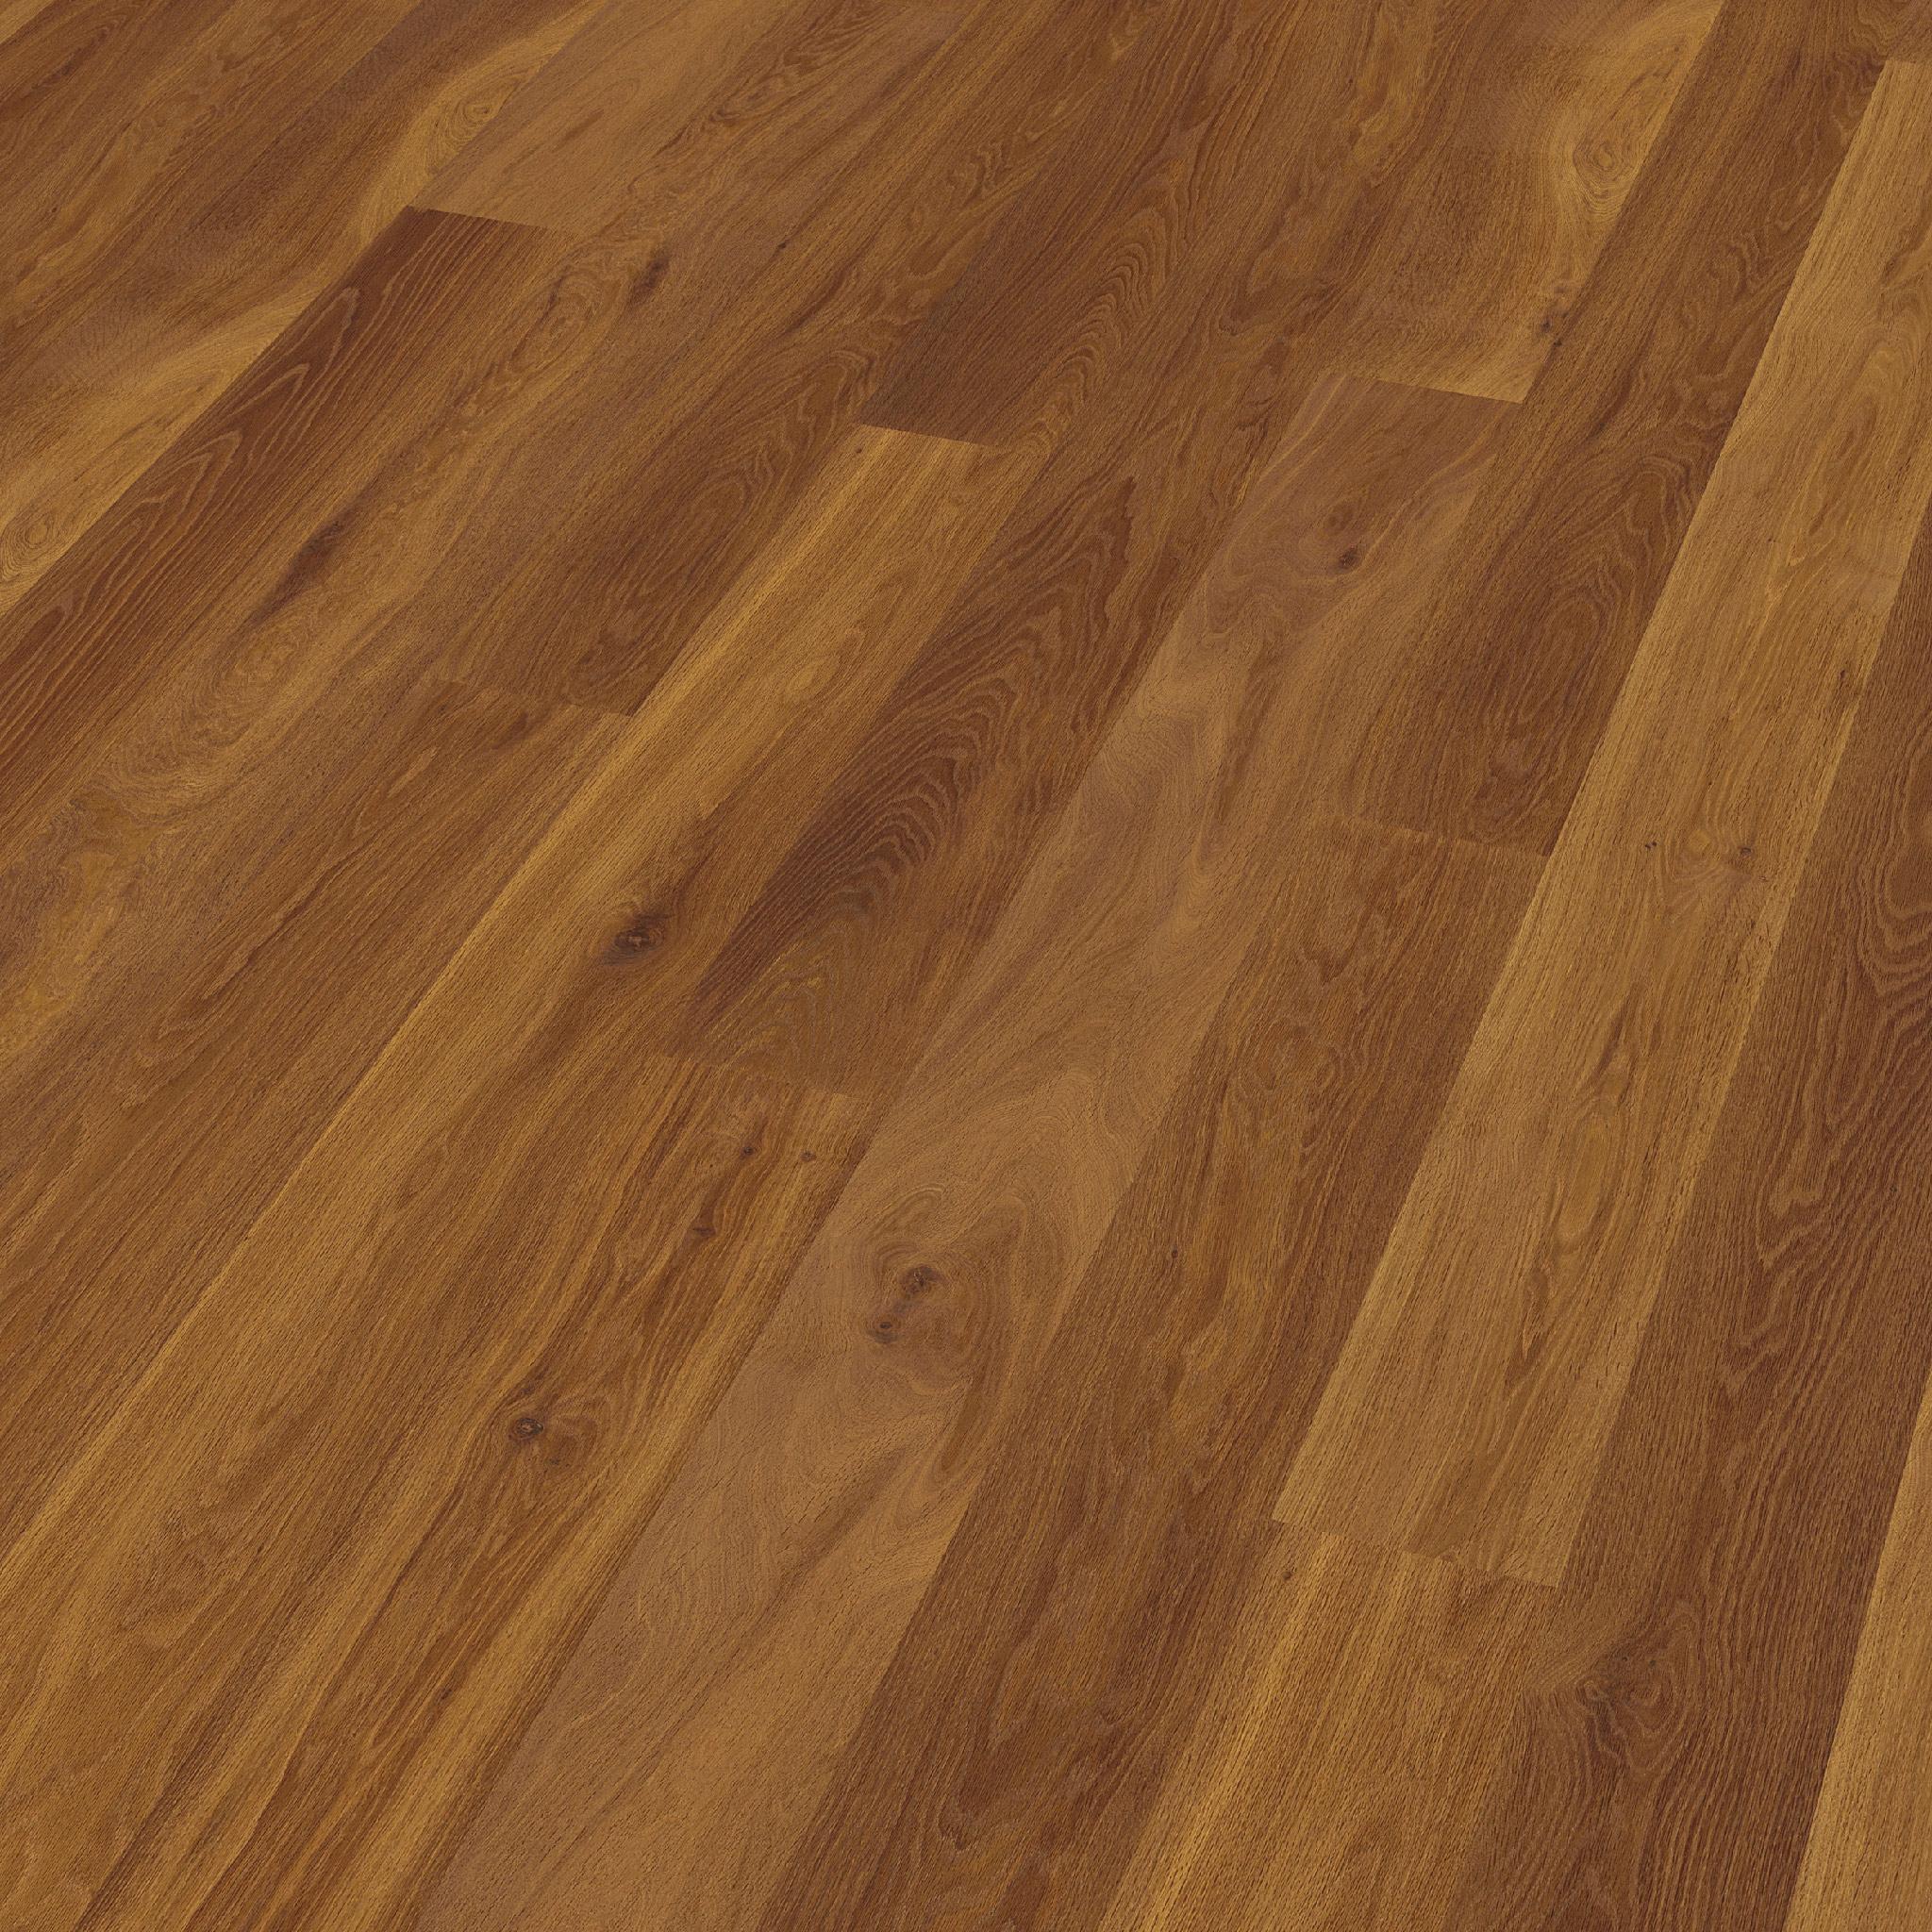 PARAT 190 Smoked Oak Medium 1-Strip